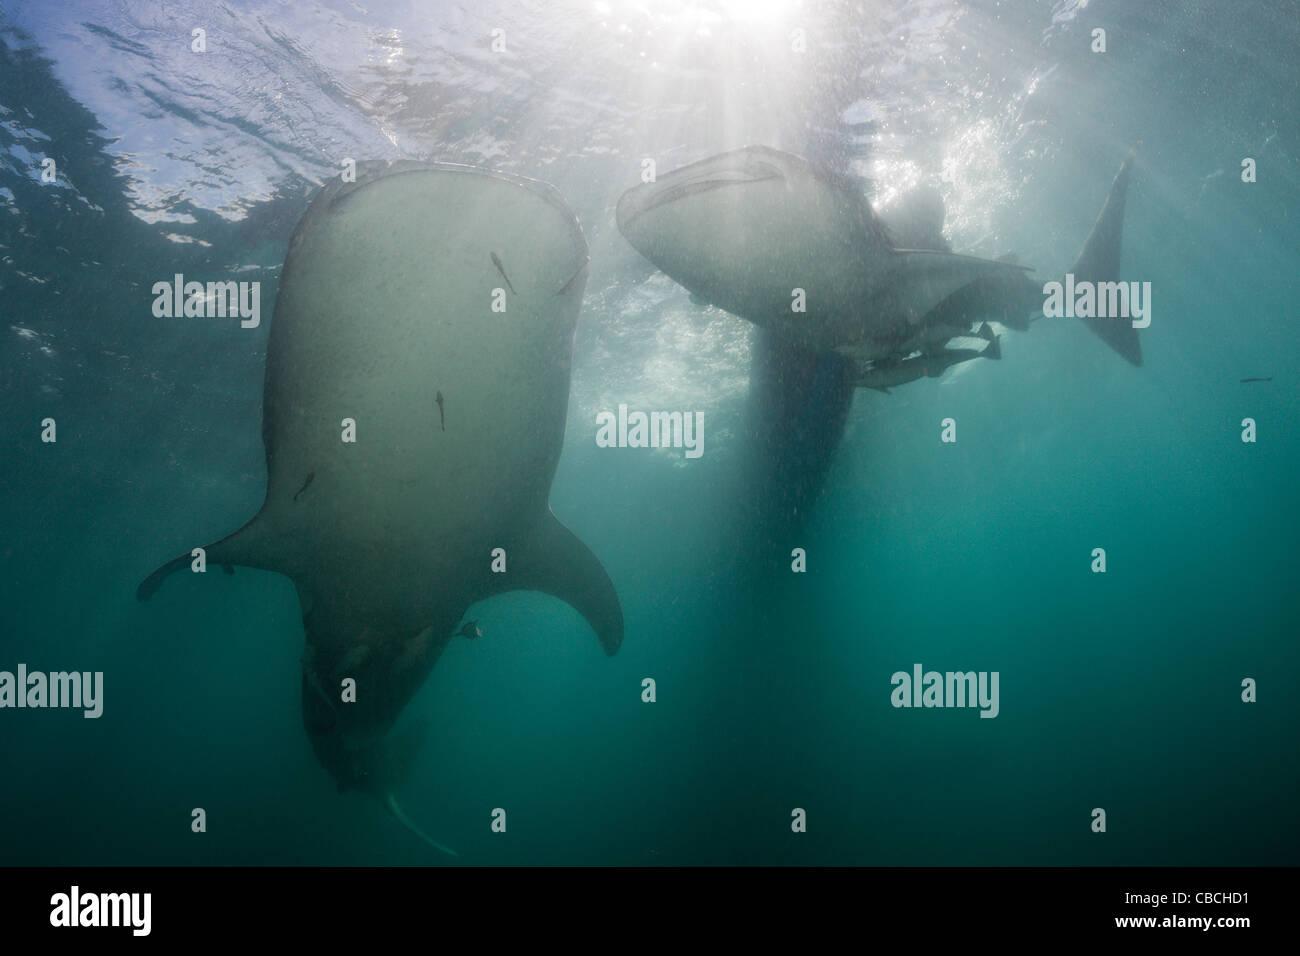 Two Whale Shark, Rhincodon typus, Cenderawasih Bay, West Papua, Indonesia - Stock Image